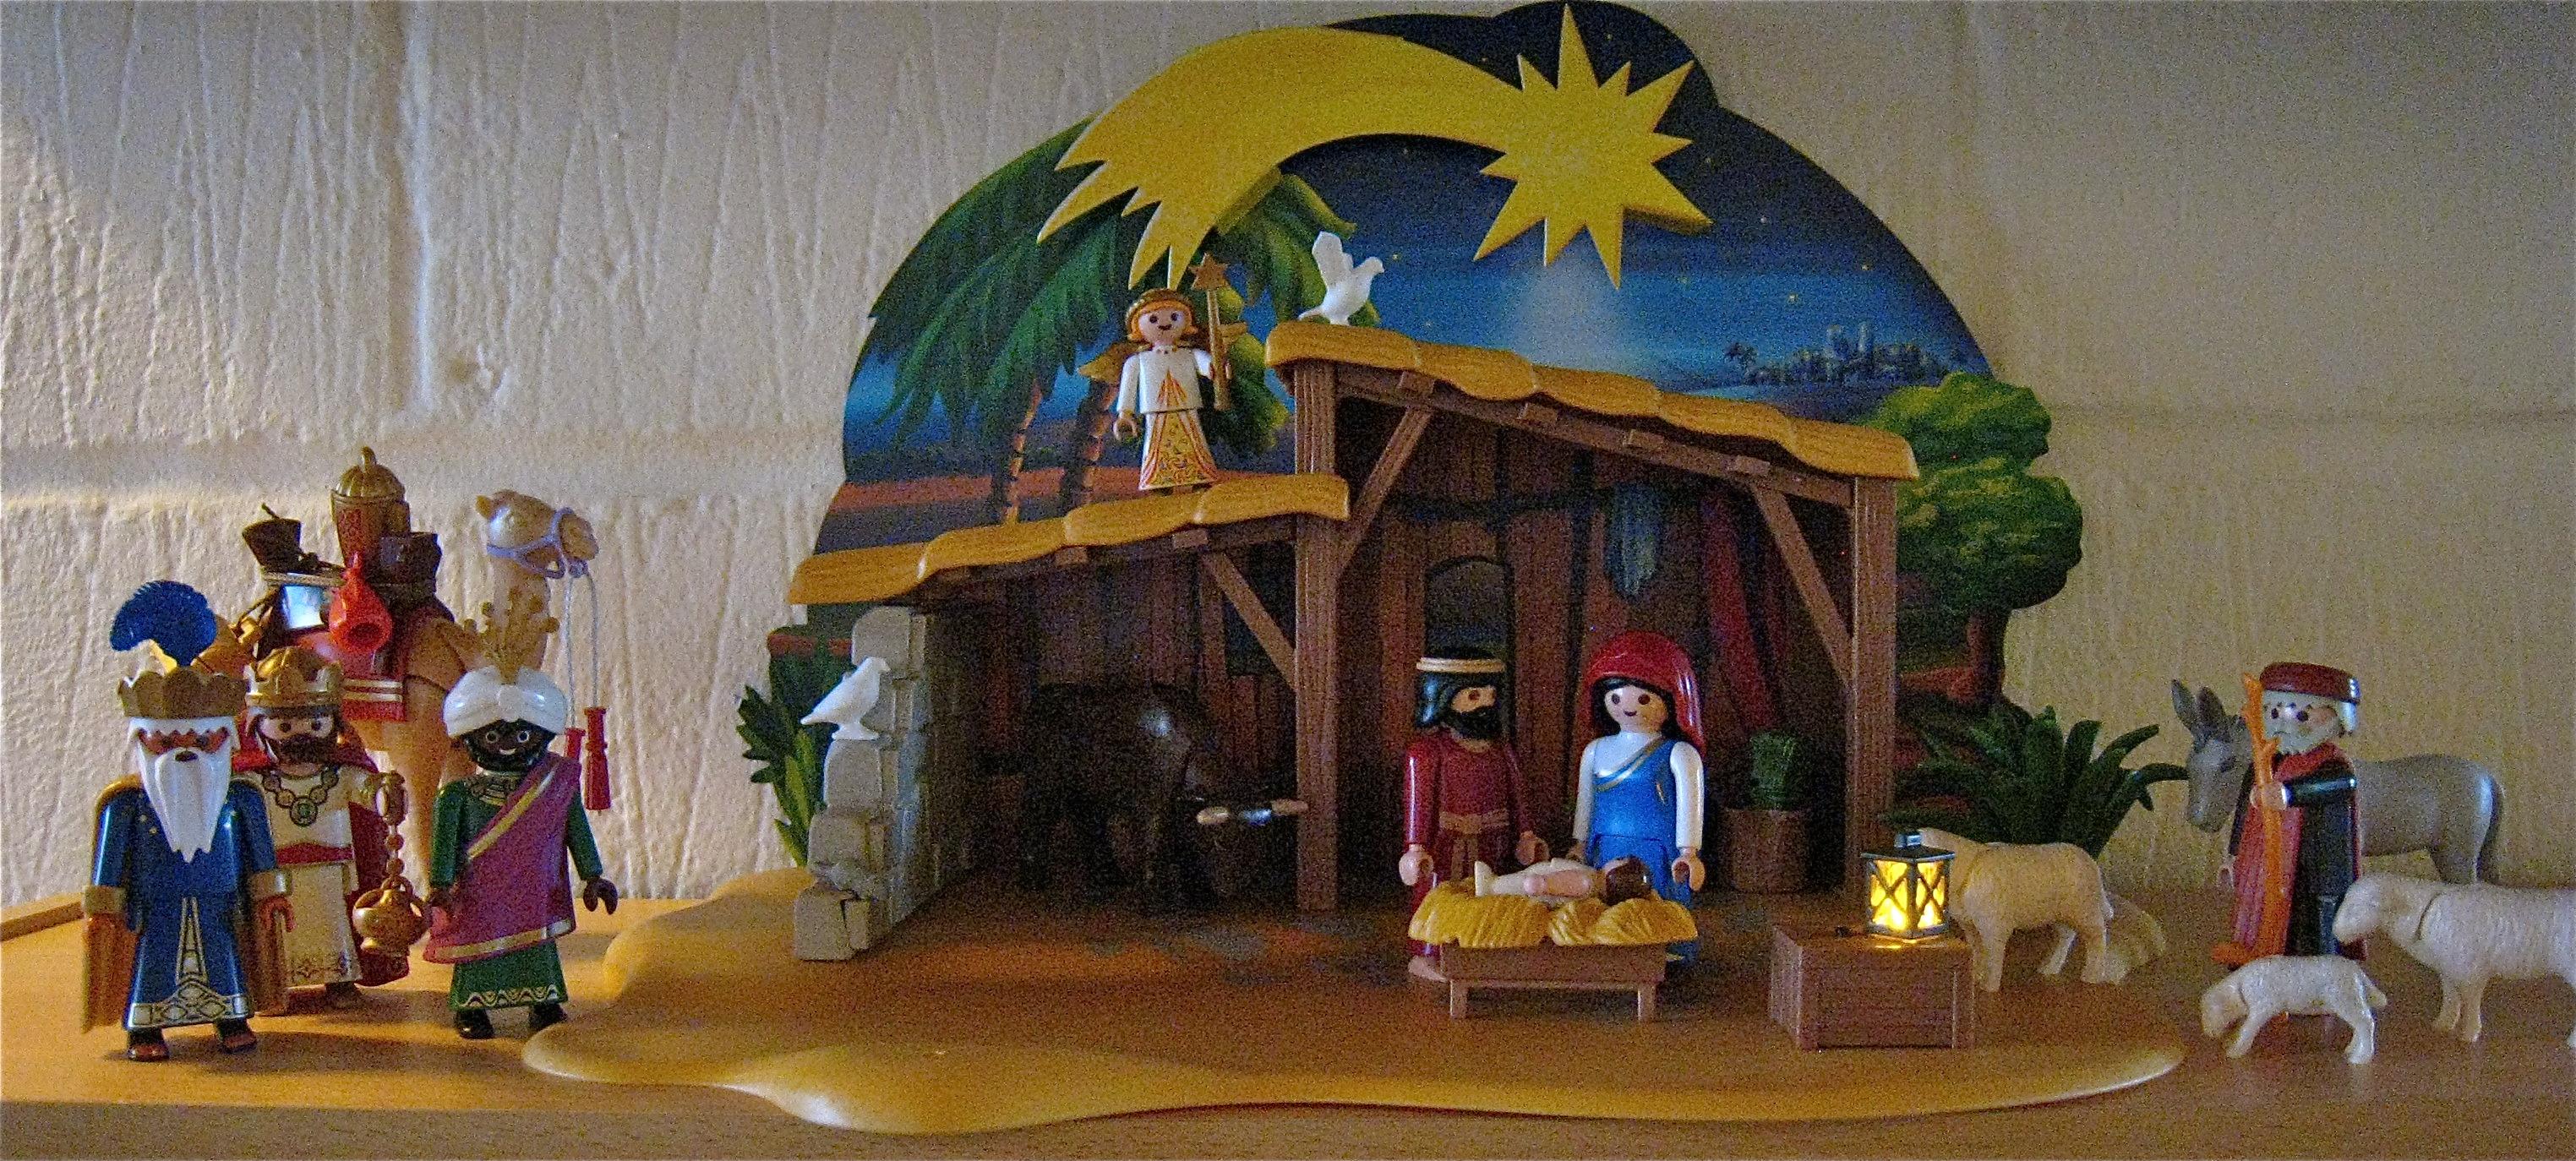 Religious Advent Calendar Ideas : Savor the days make your own lego advent calendar lego challenge